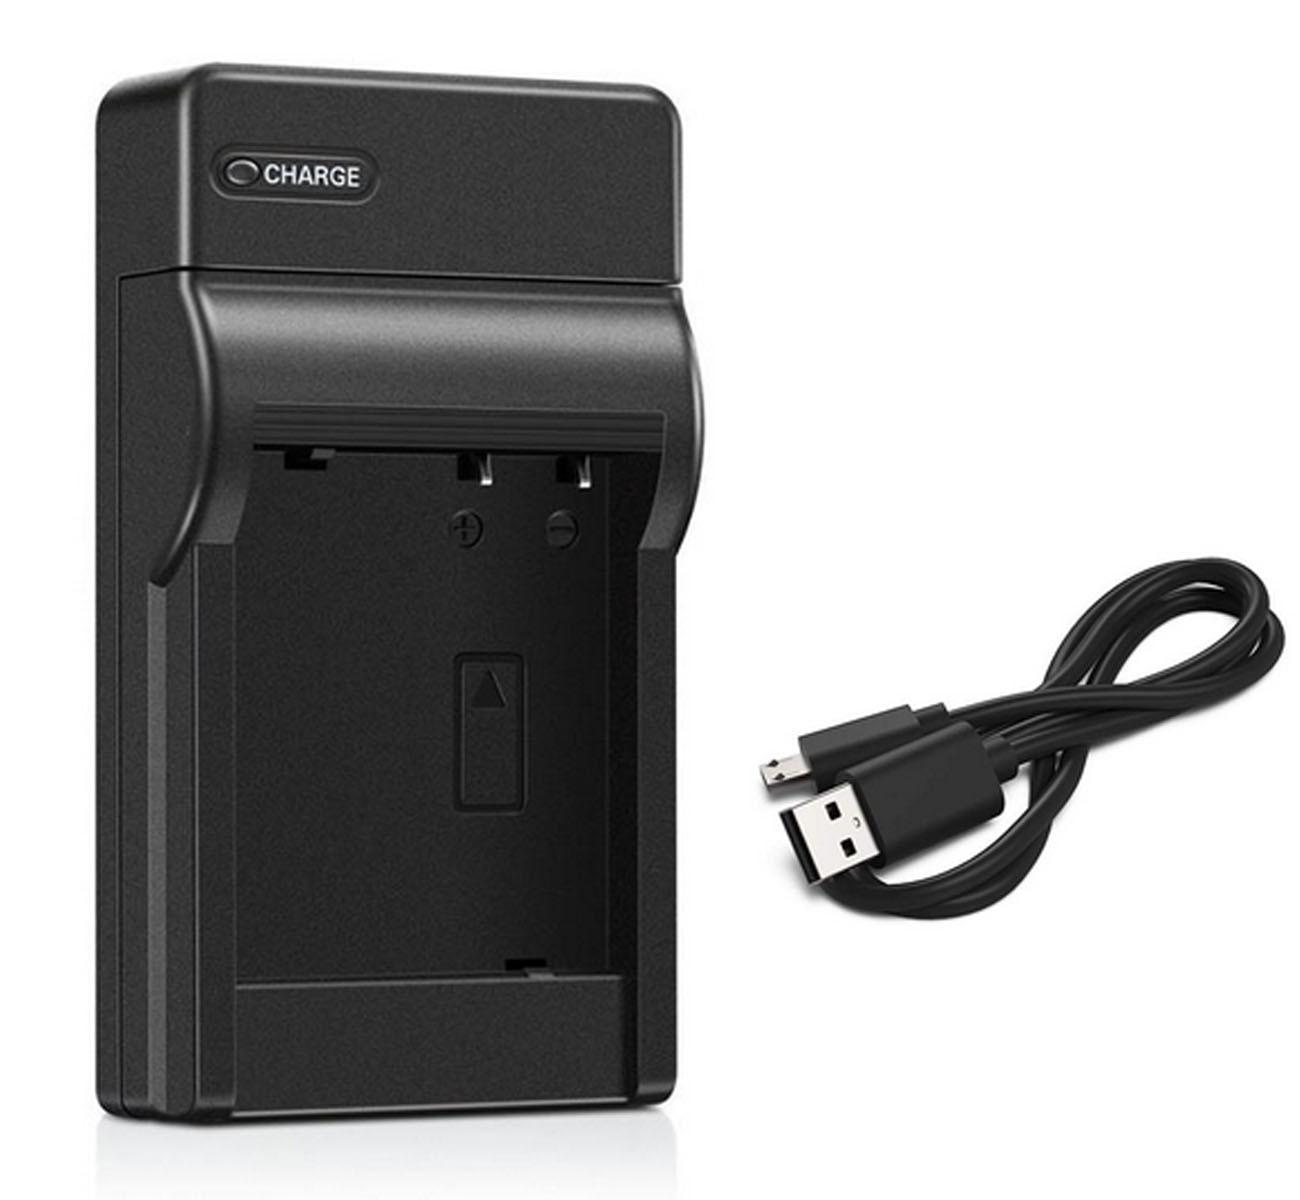 Cable USB Original Panasonic HC-V720 V110 V130 V160 V201 V210 V230 V10 HDC-SD80